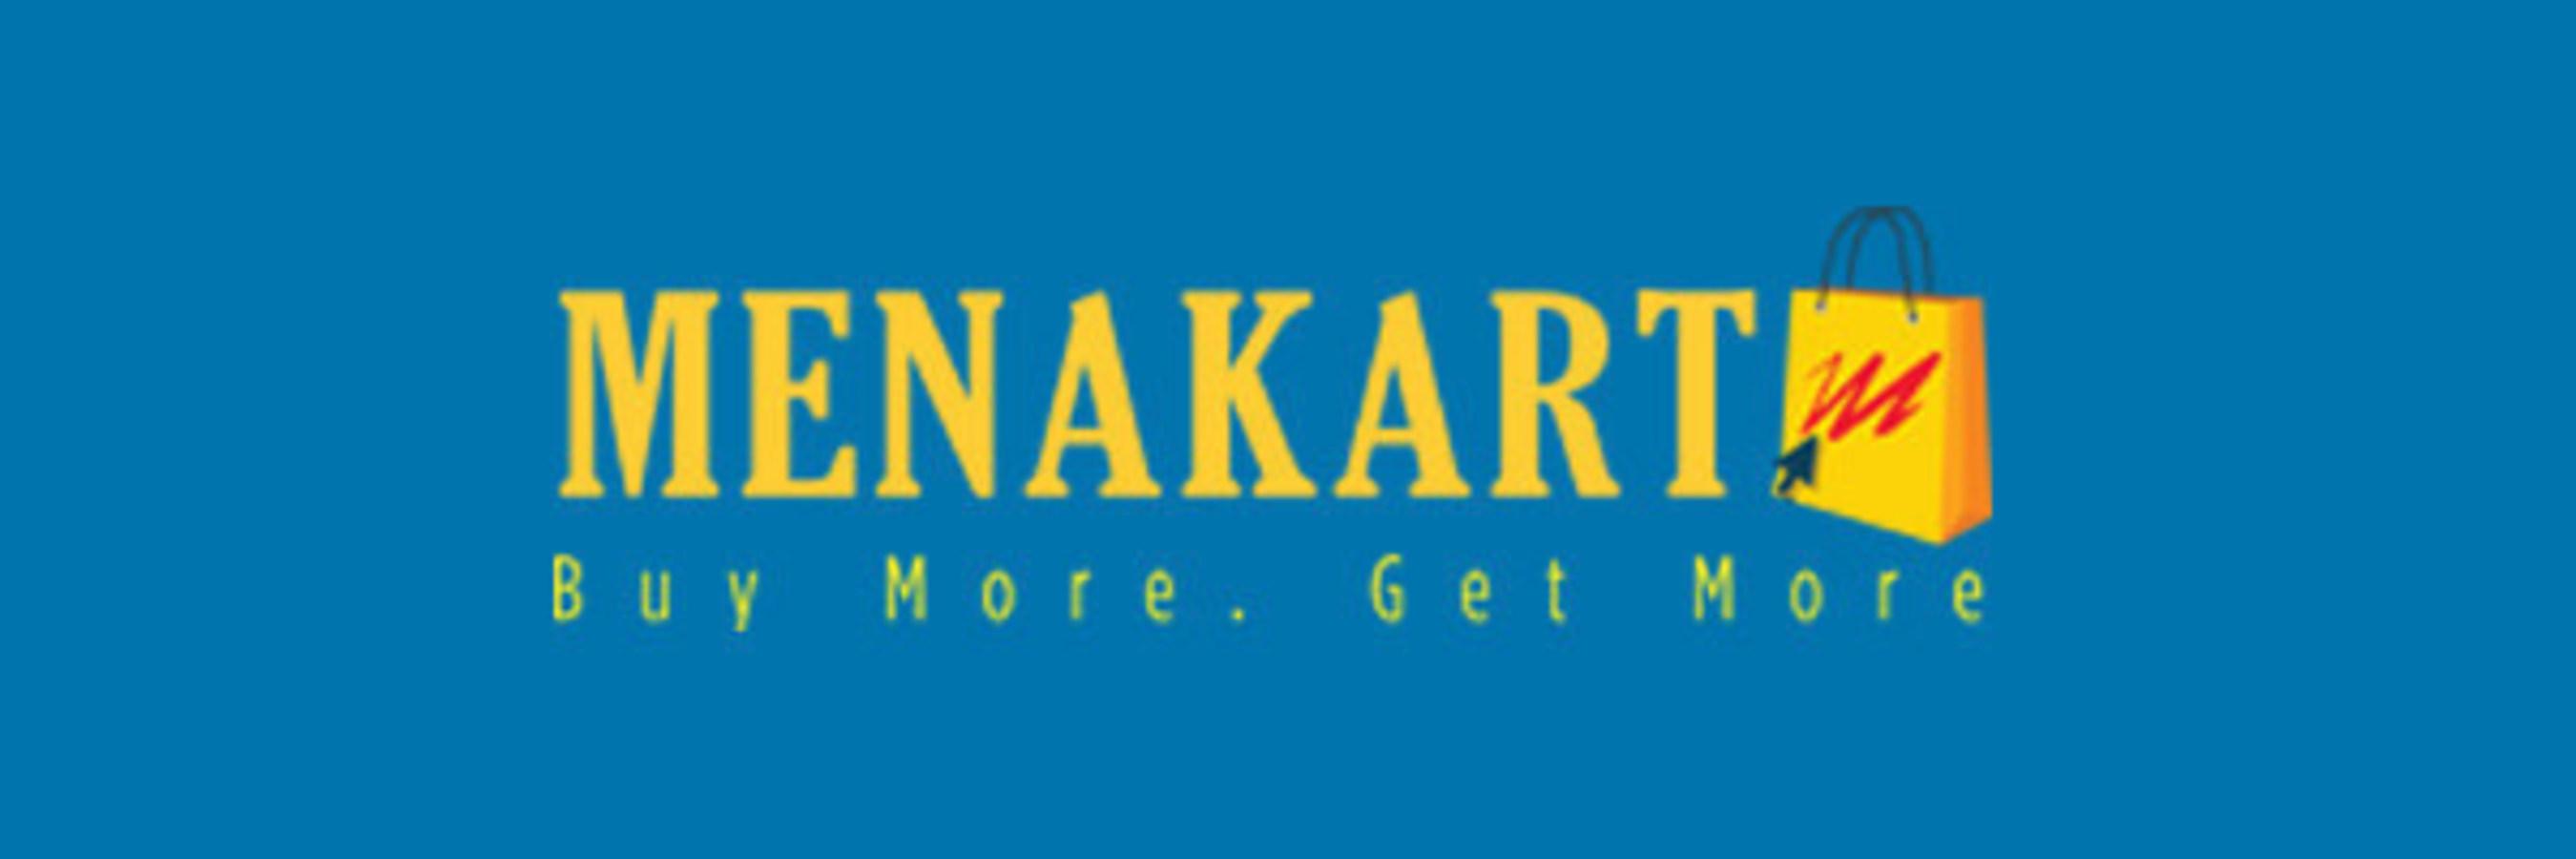 Online shopping in UAE (Menakart) (PRNewsFoto/Menakart)